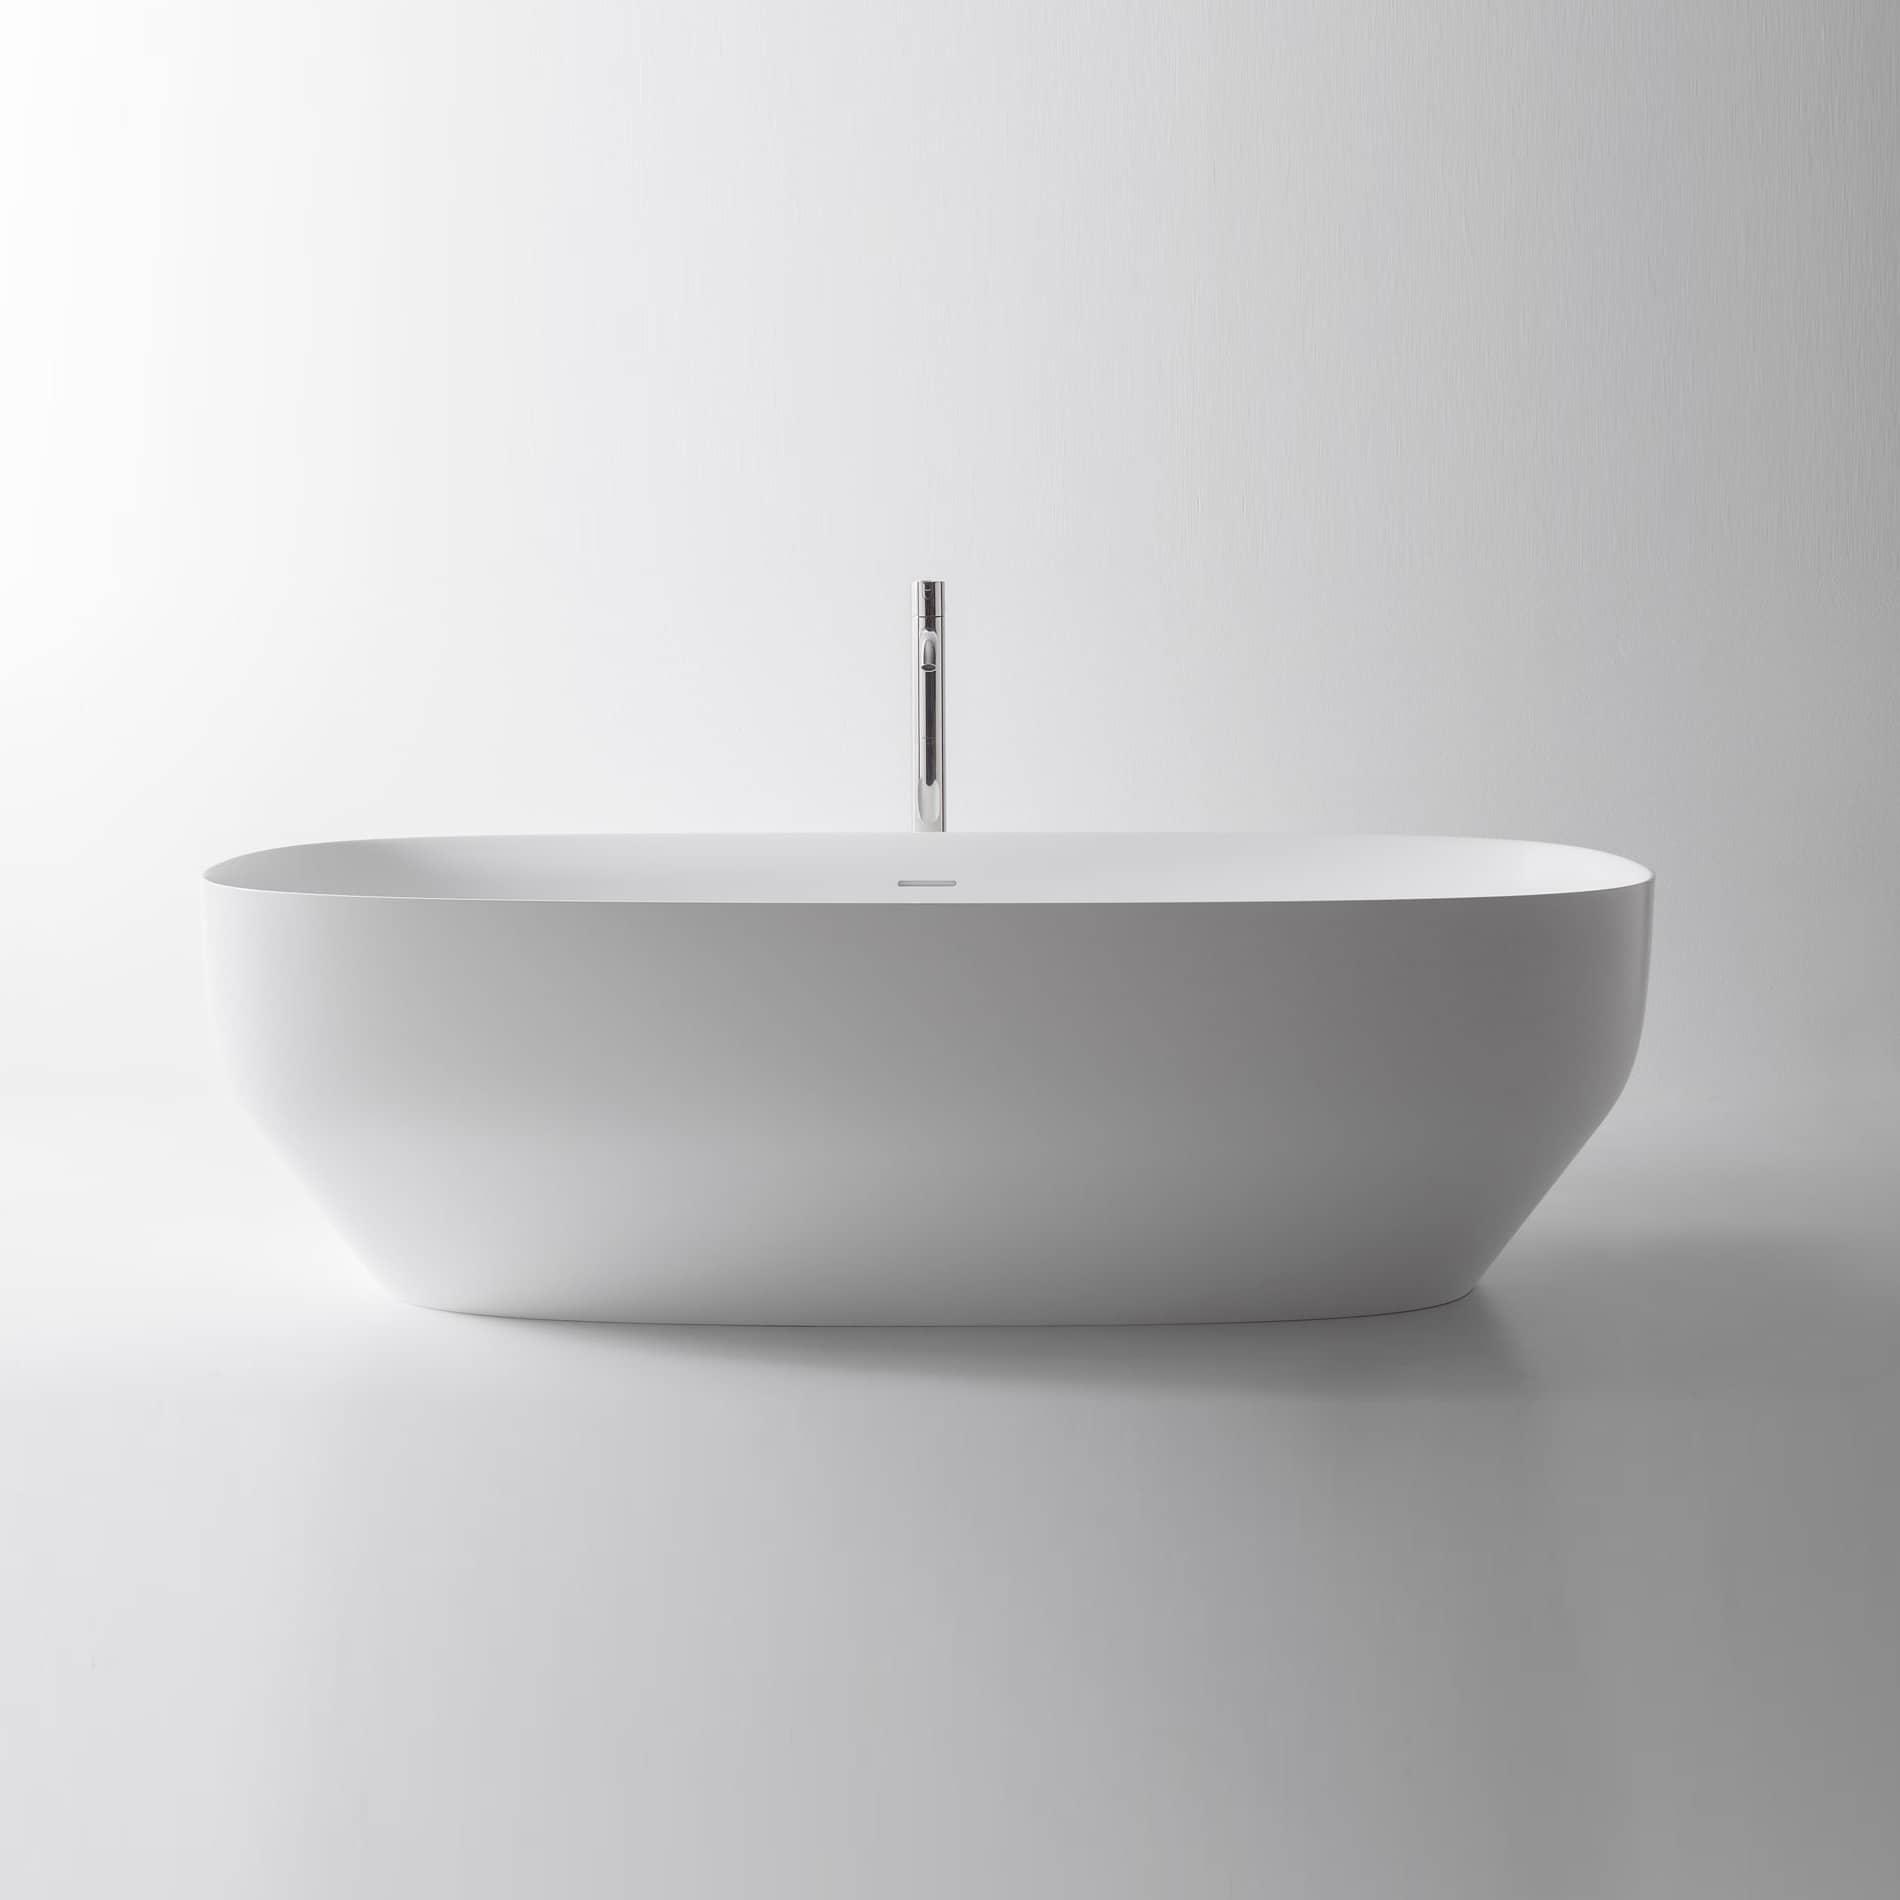 Cristalplant-products-Antoniolupi-tub-2